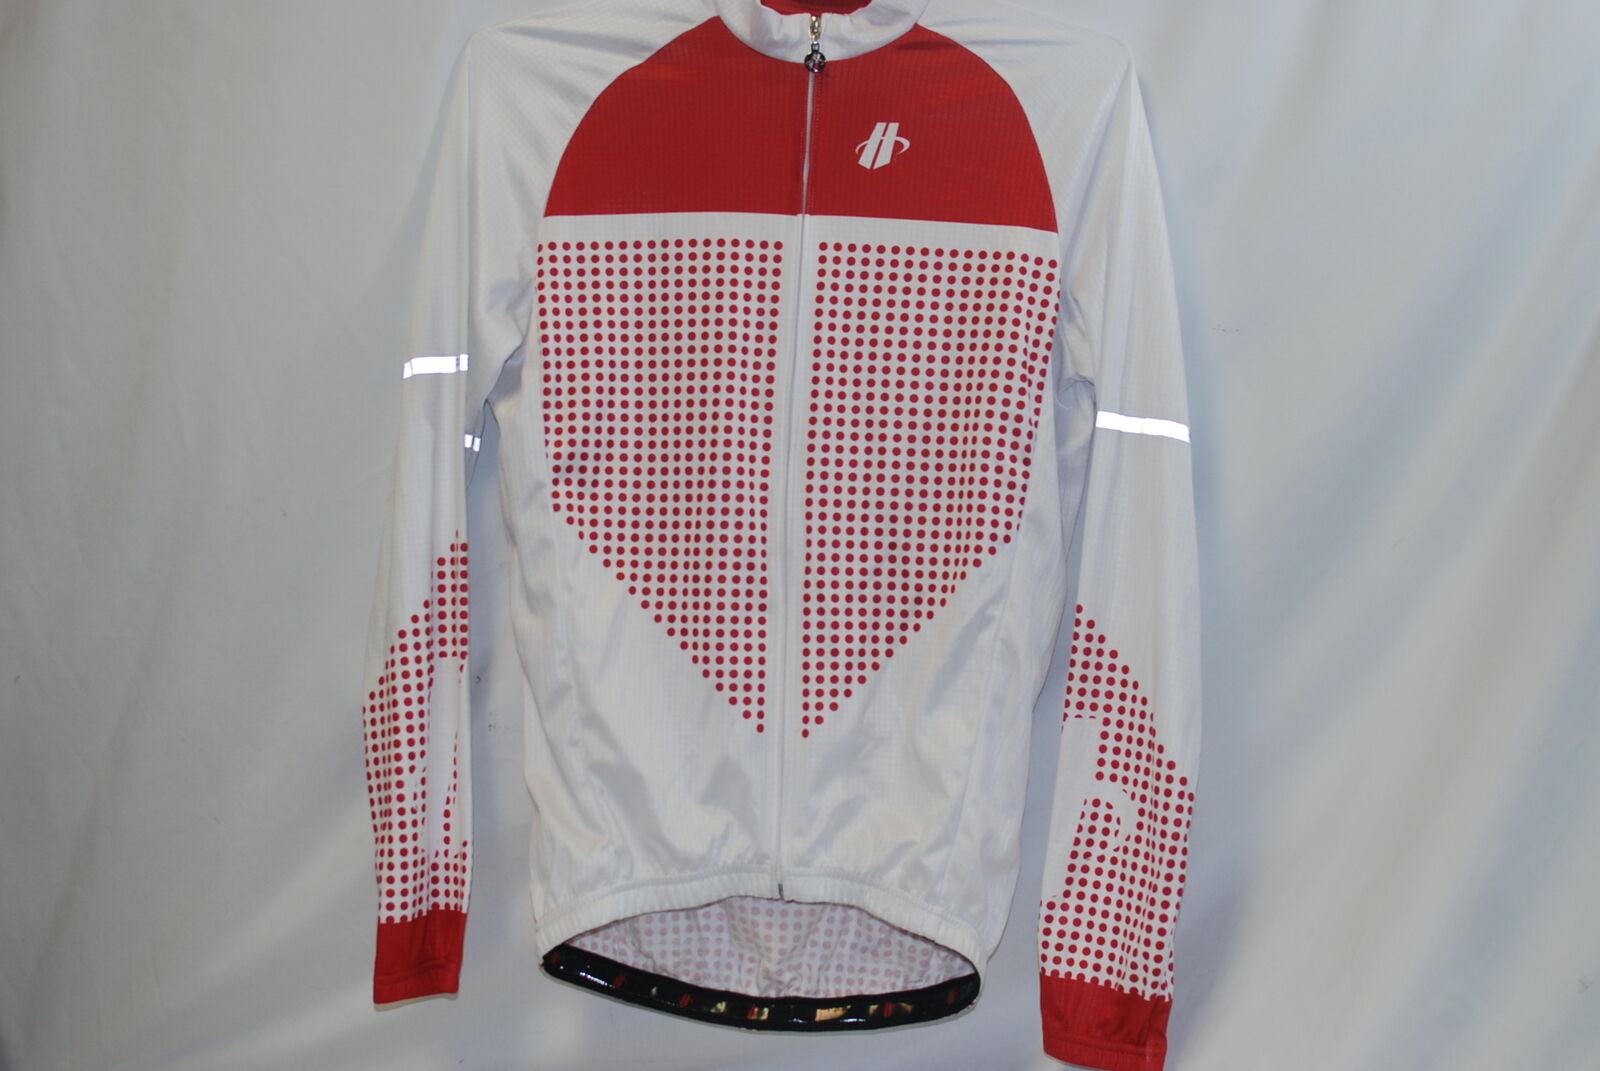 Hincapie Ls Vantage Maglione da Ciclismo M  Herren Rosso Bianco Manica Lunga Nuovo